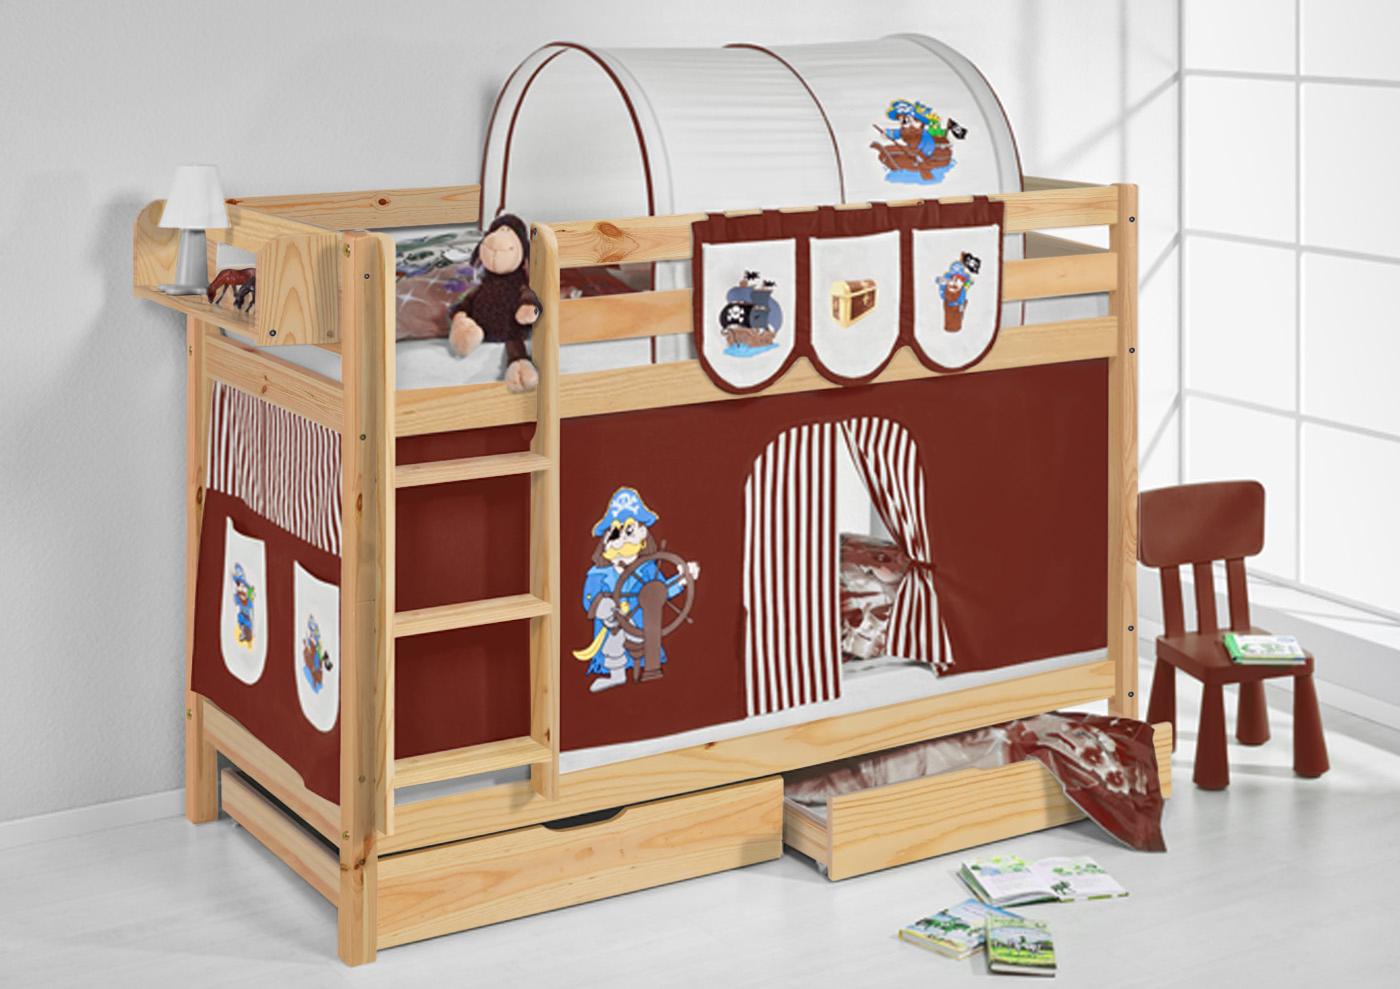 etagenbett hochbett kinder bett aus massiver kiefer jelle natur vorhang ebay. Black Bedroom Furniture Sets. Home Design Ideas